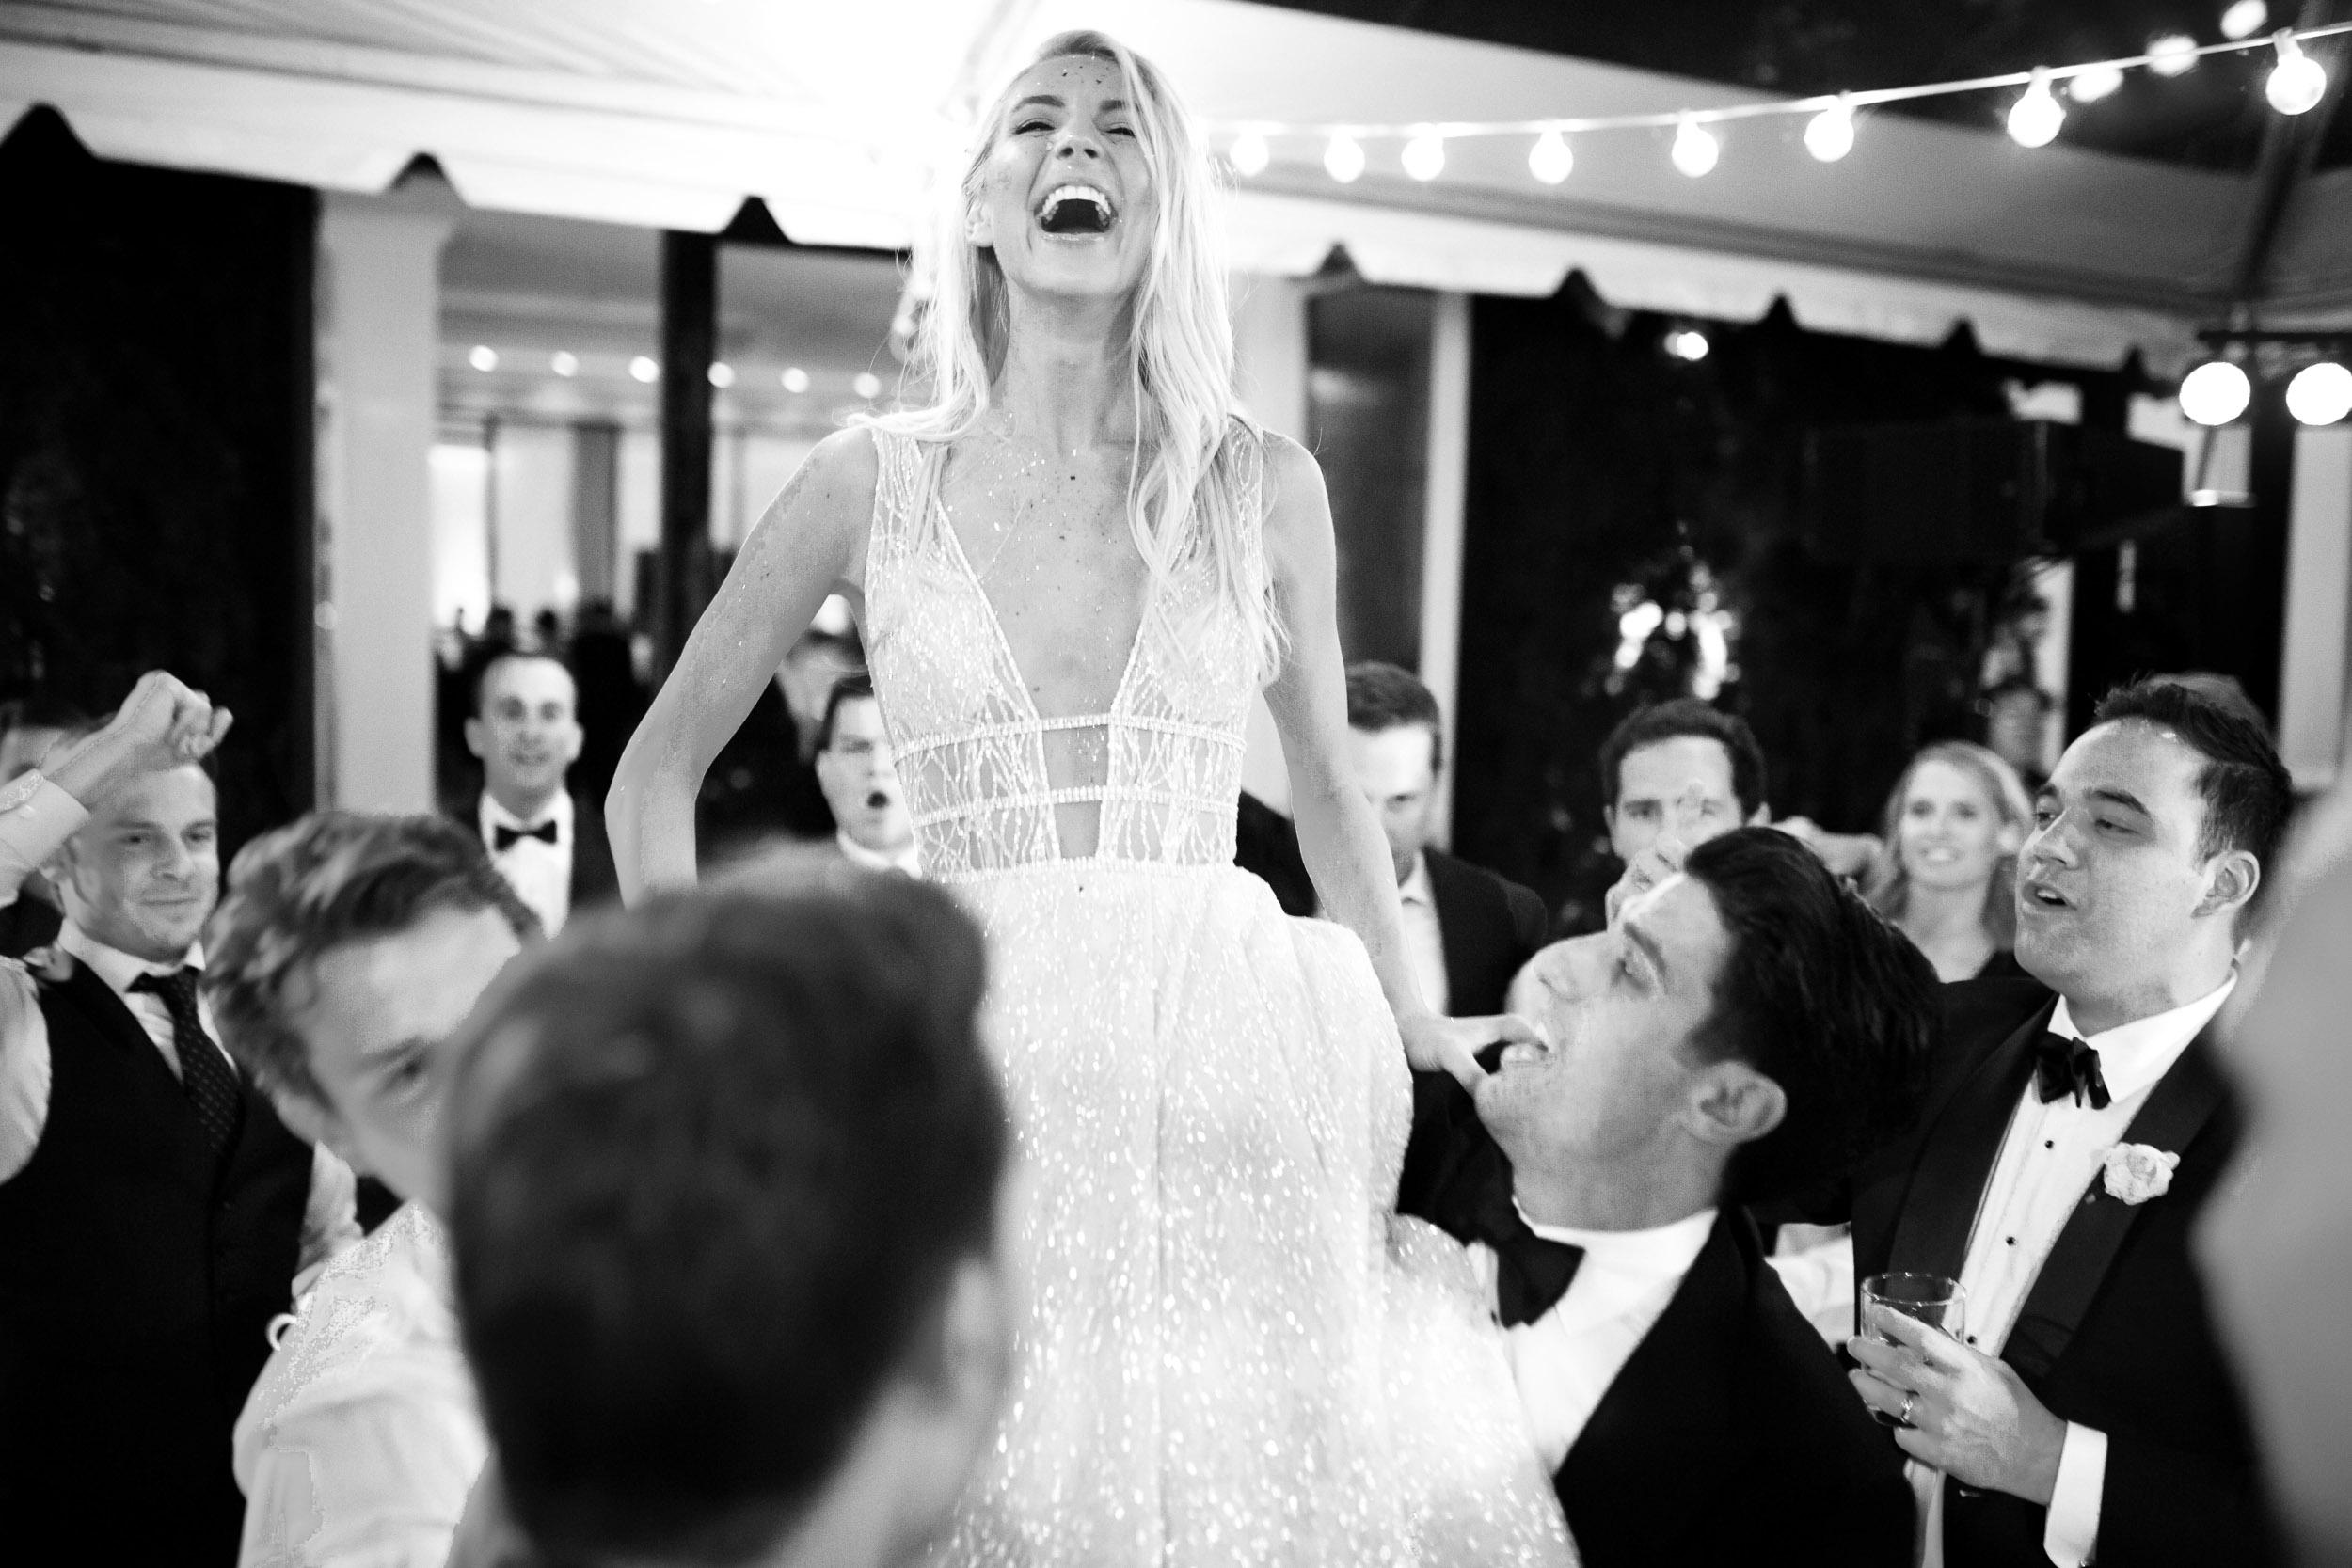 chicago-illuminating-co-wedding-photos-82.jpg